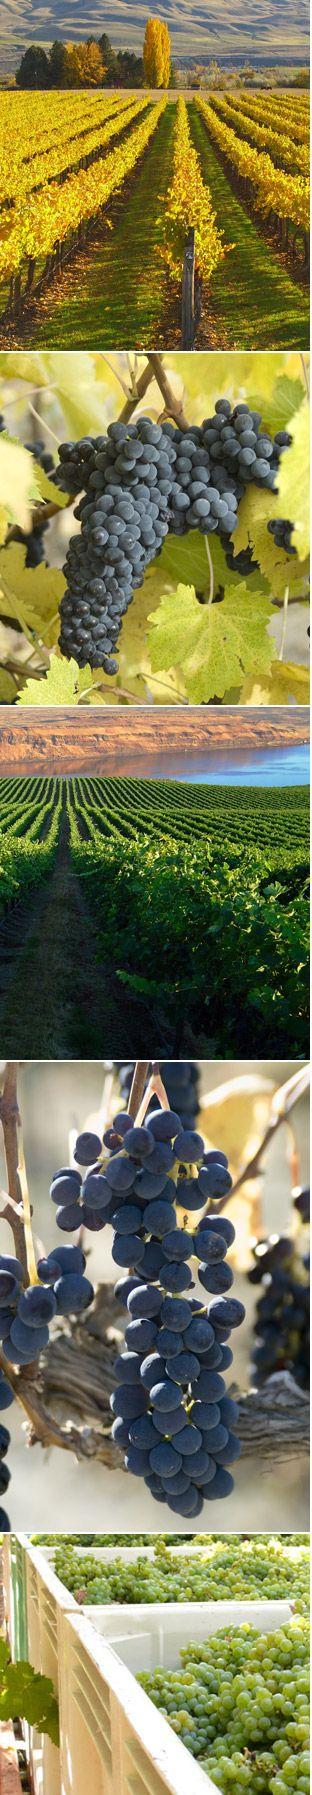 One of my favorite Washington wineries, Maison Bleue